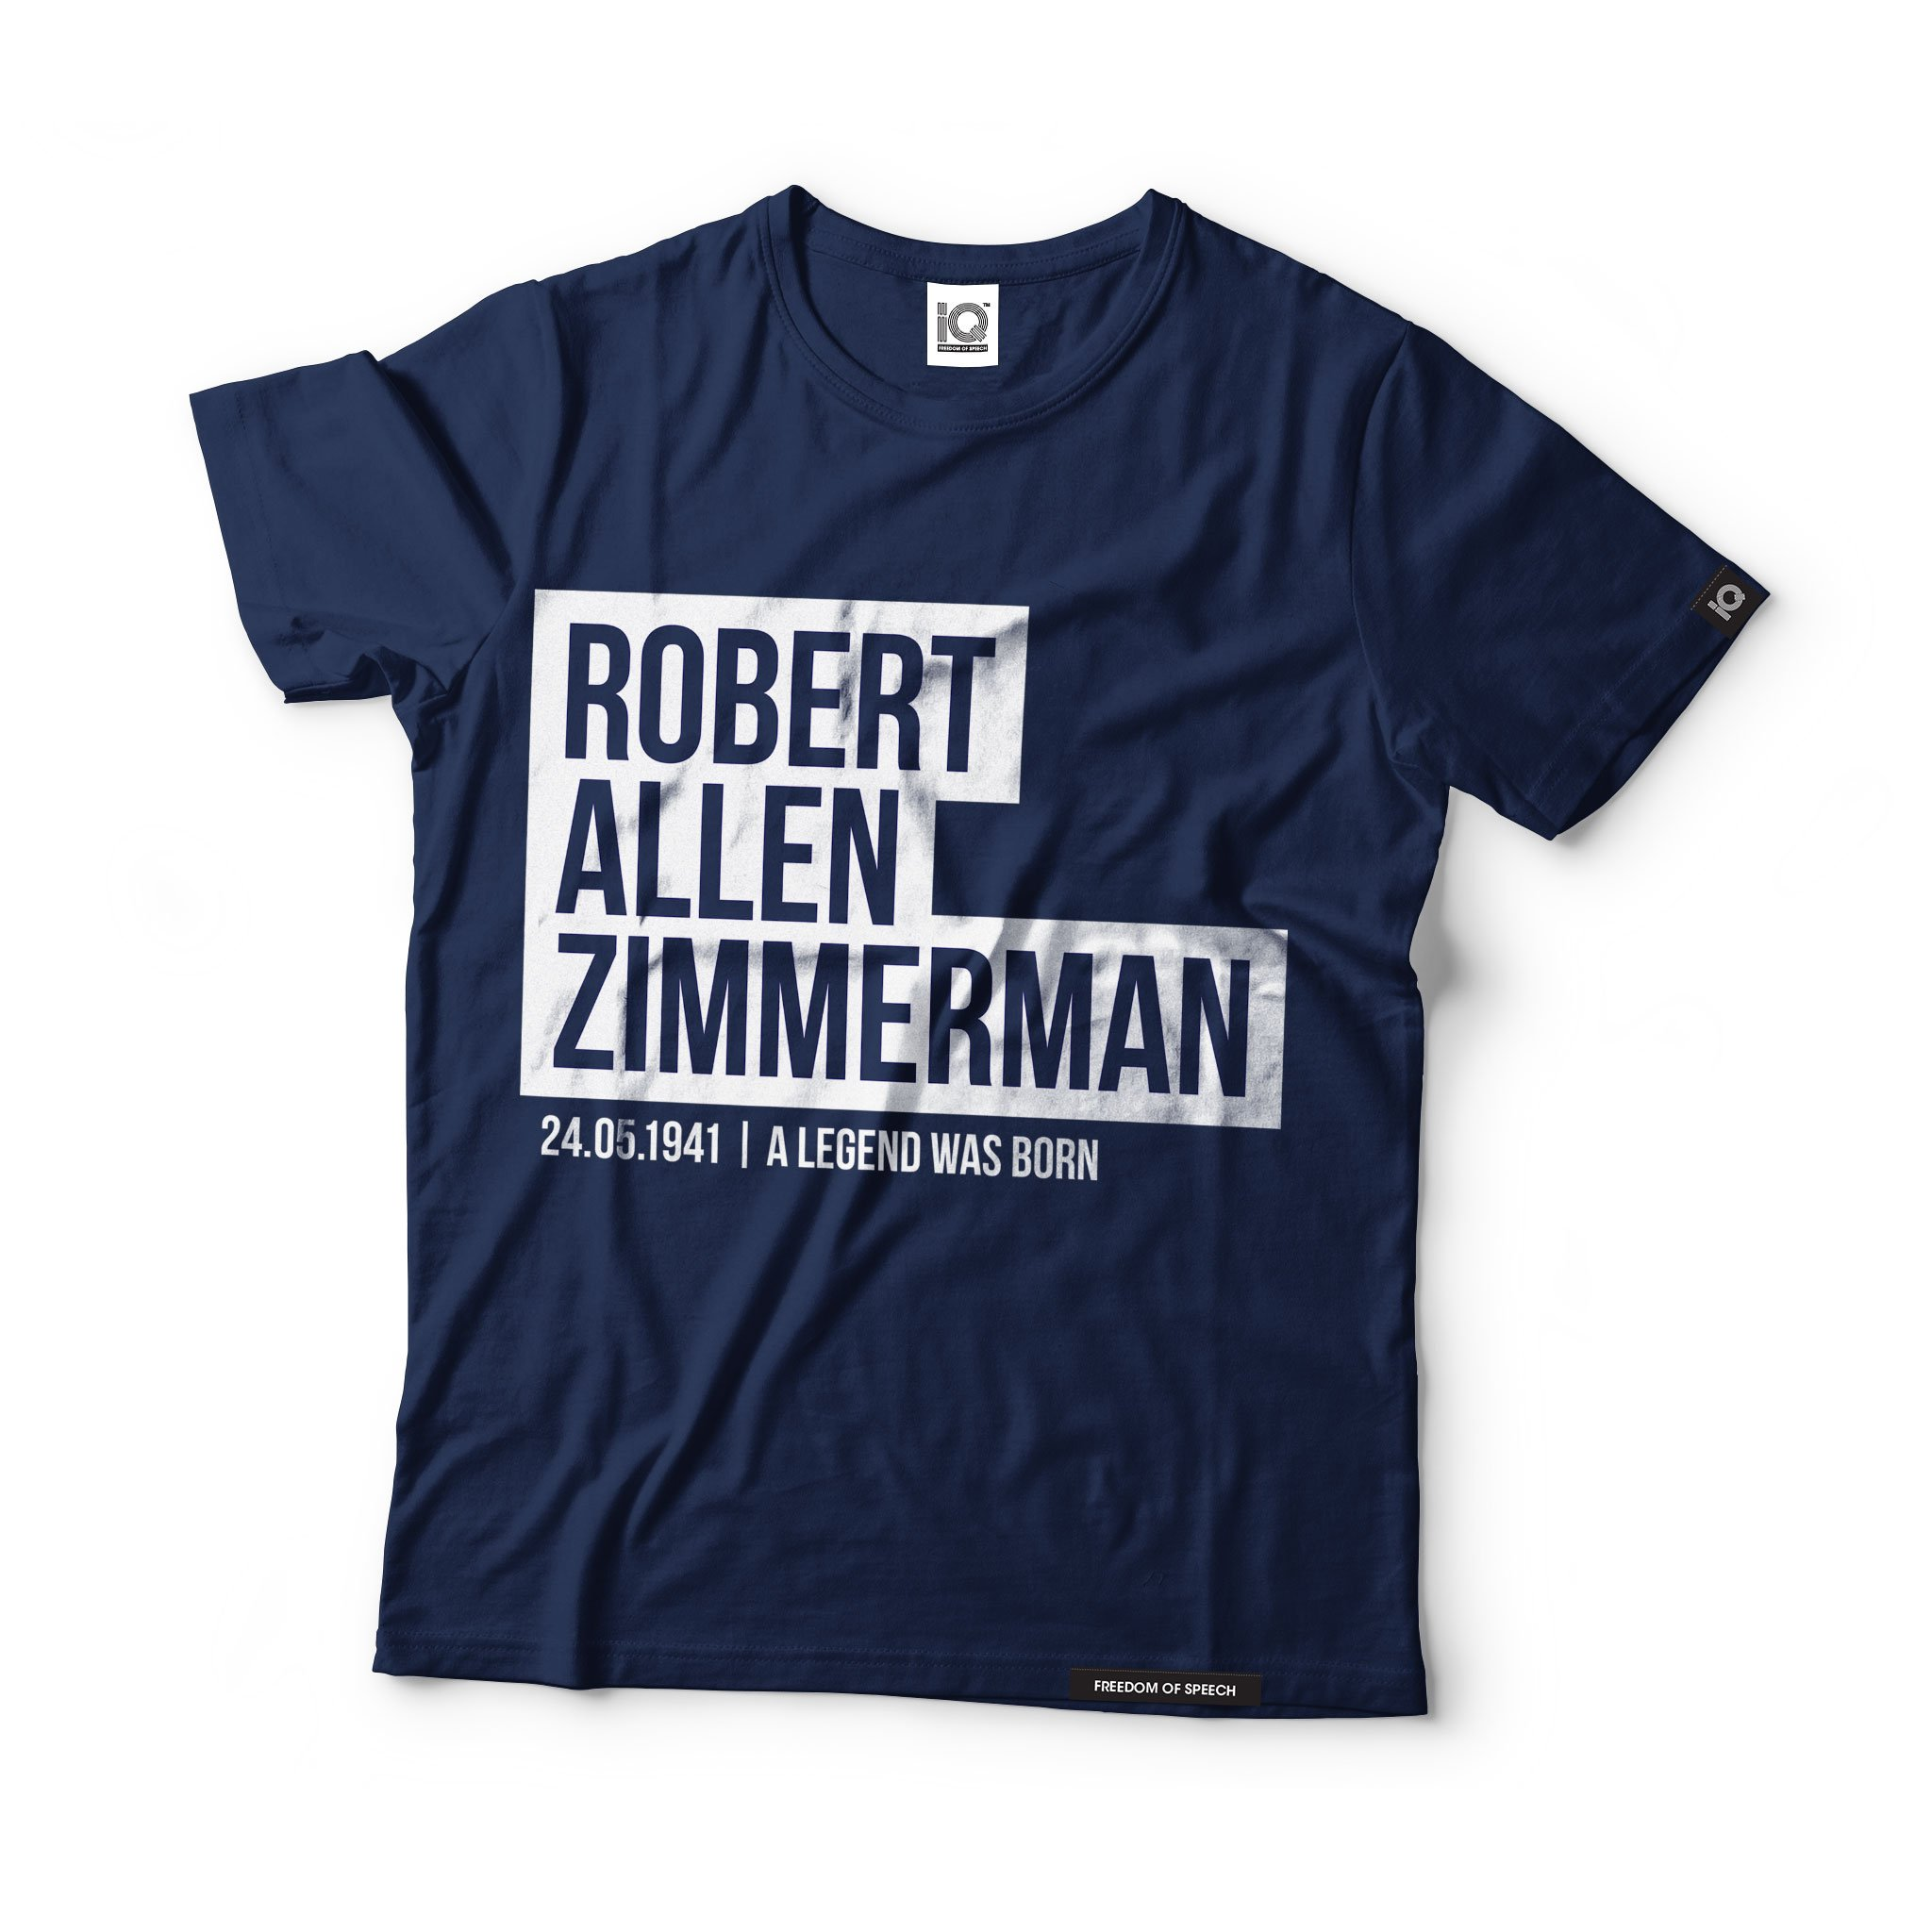 We Are Iq Robert Allen Zimmerman T Shirt Made Great In